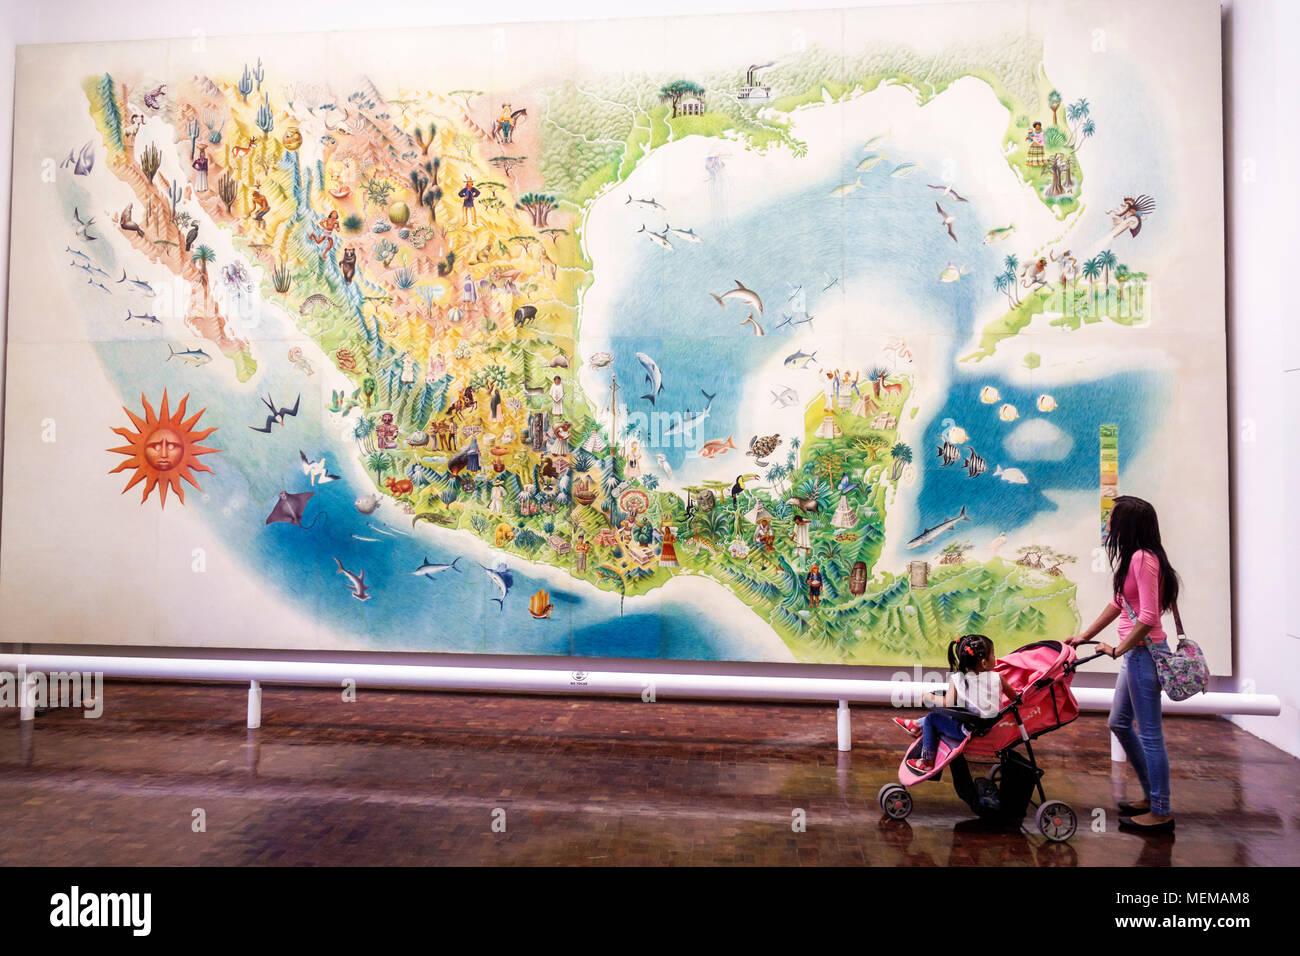 Mexico City Mexico Ciudad de Federal District Distrito DF D.F. CDMX Mexican Hispanic Centro Historico Historic Center Centre Museo de Arte Popular Popular Art Museum folk art inside exhibit mural map Miguel Covarrubias Gulf of Mexico regional cultures woman girl teen boy family looking North America American - Stock Image